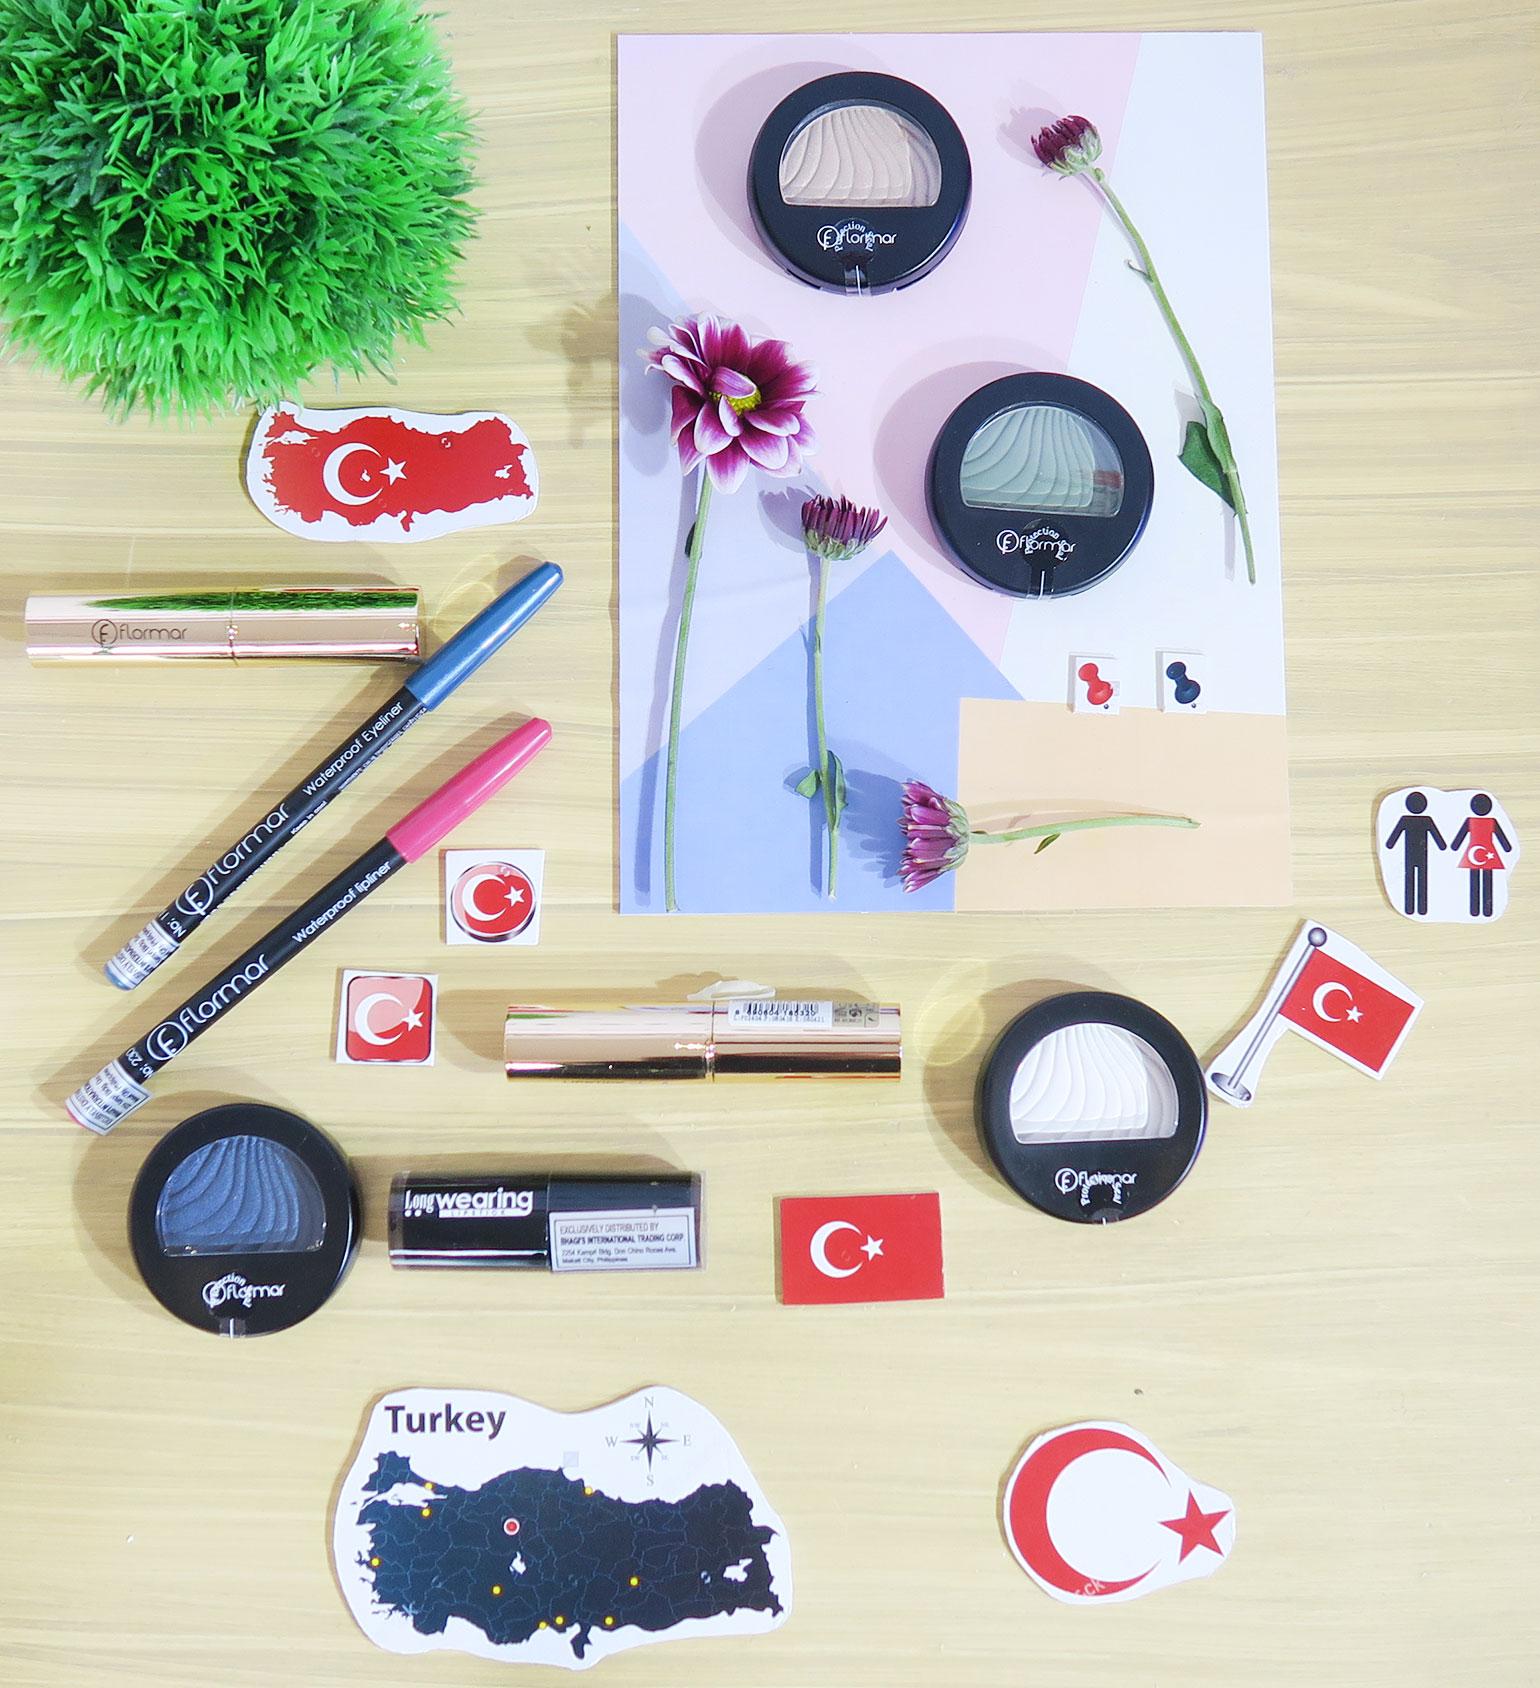 5.1 Flormar Cosmetics Distributed by Bhagi's International Trading Corporation - Gen-zel.com (c)